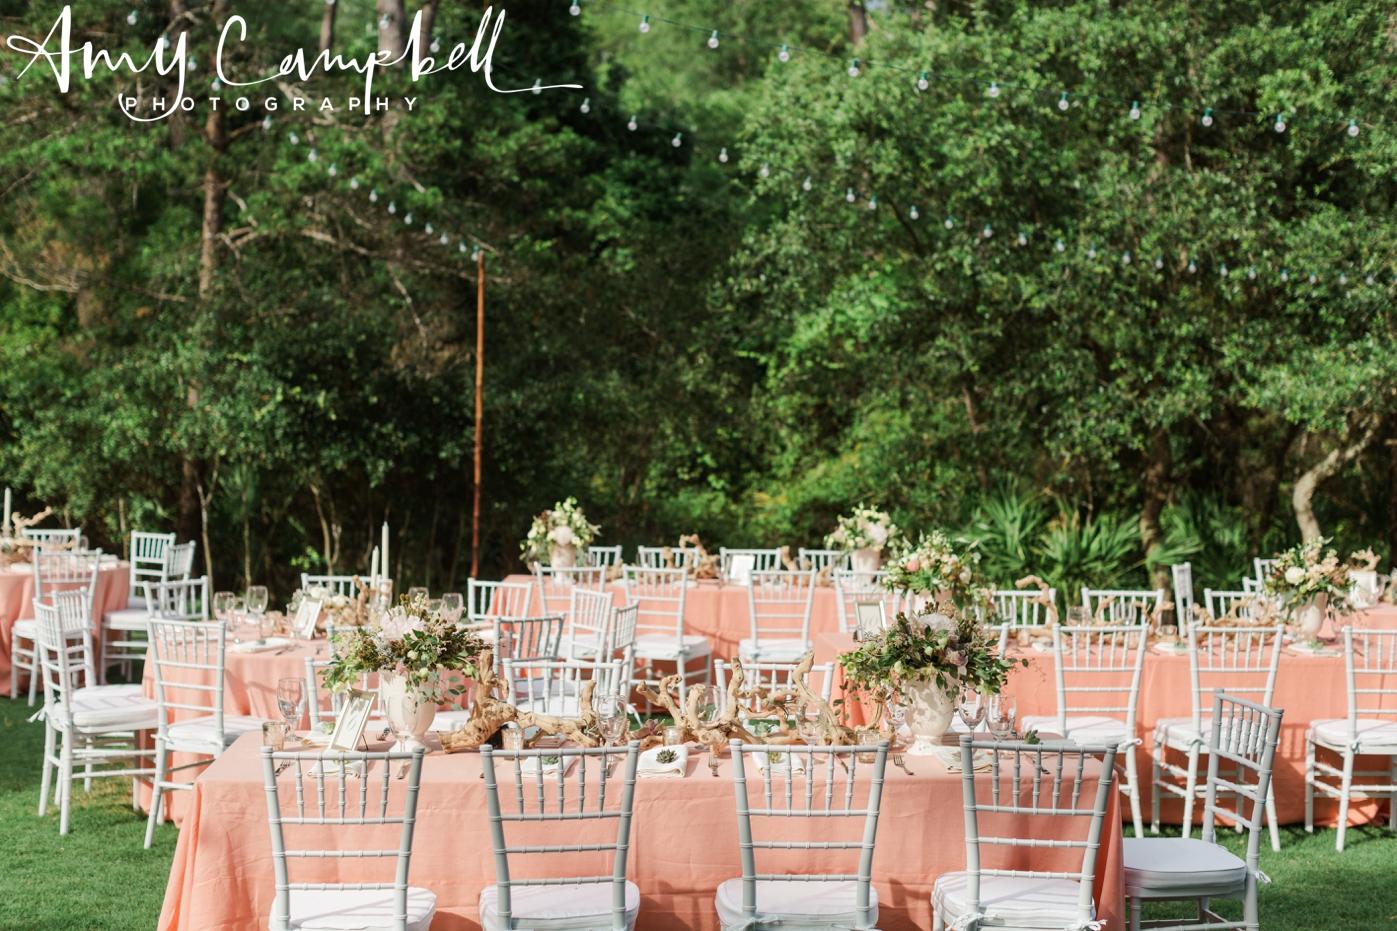 emilyreed_wed_blog_amycampbellphotography_0053.jpg